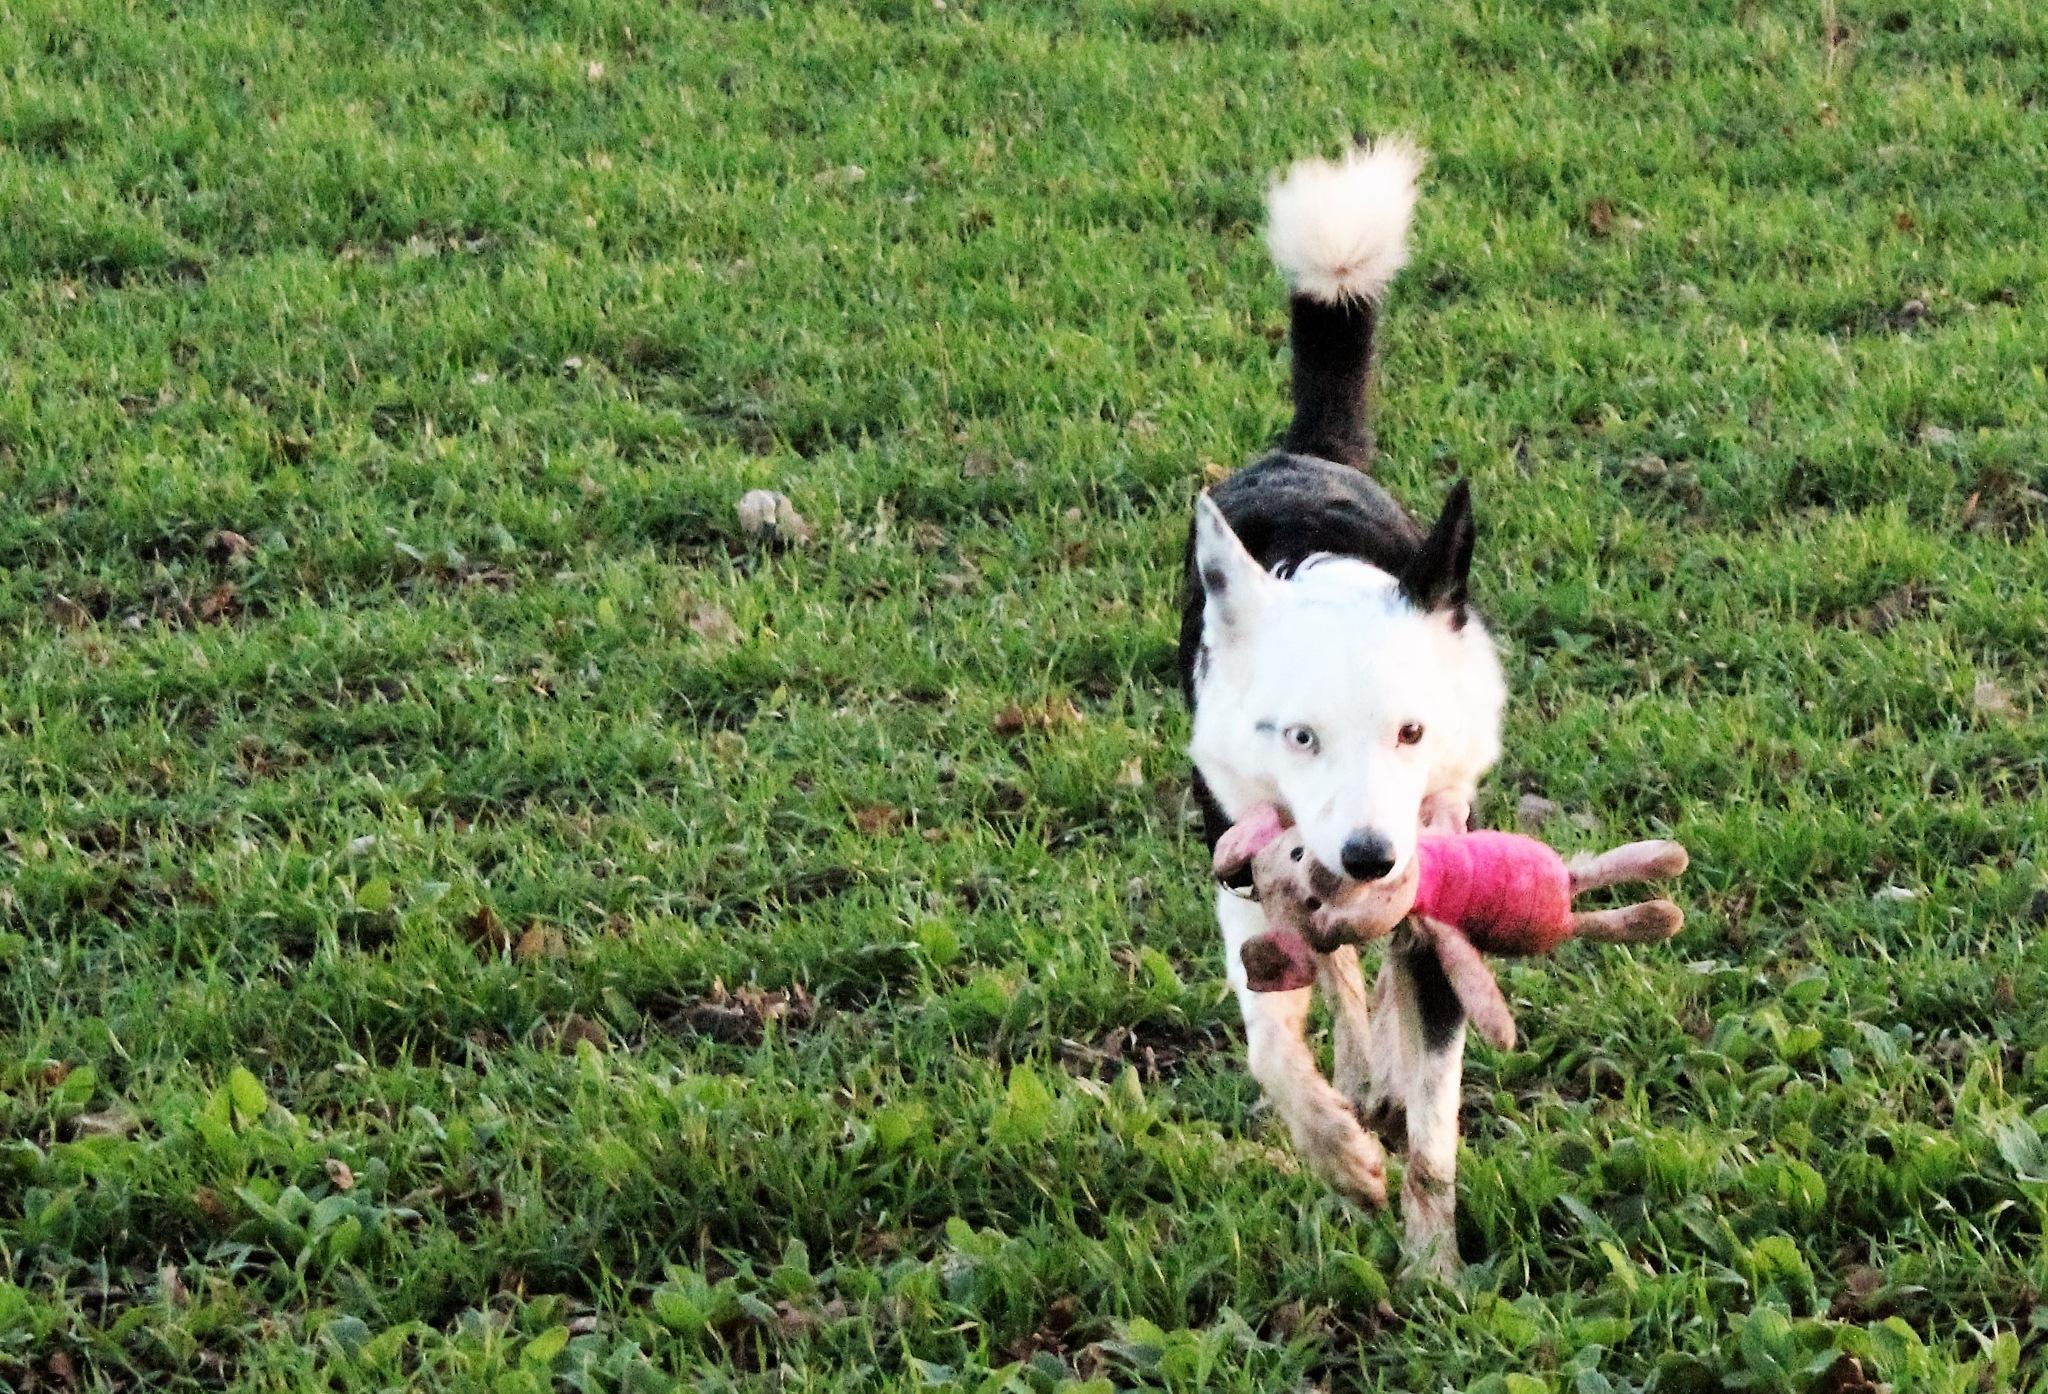 A dog ad his toy by gary.macnicol